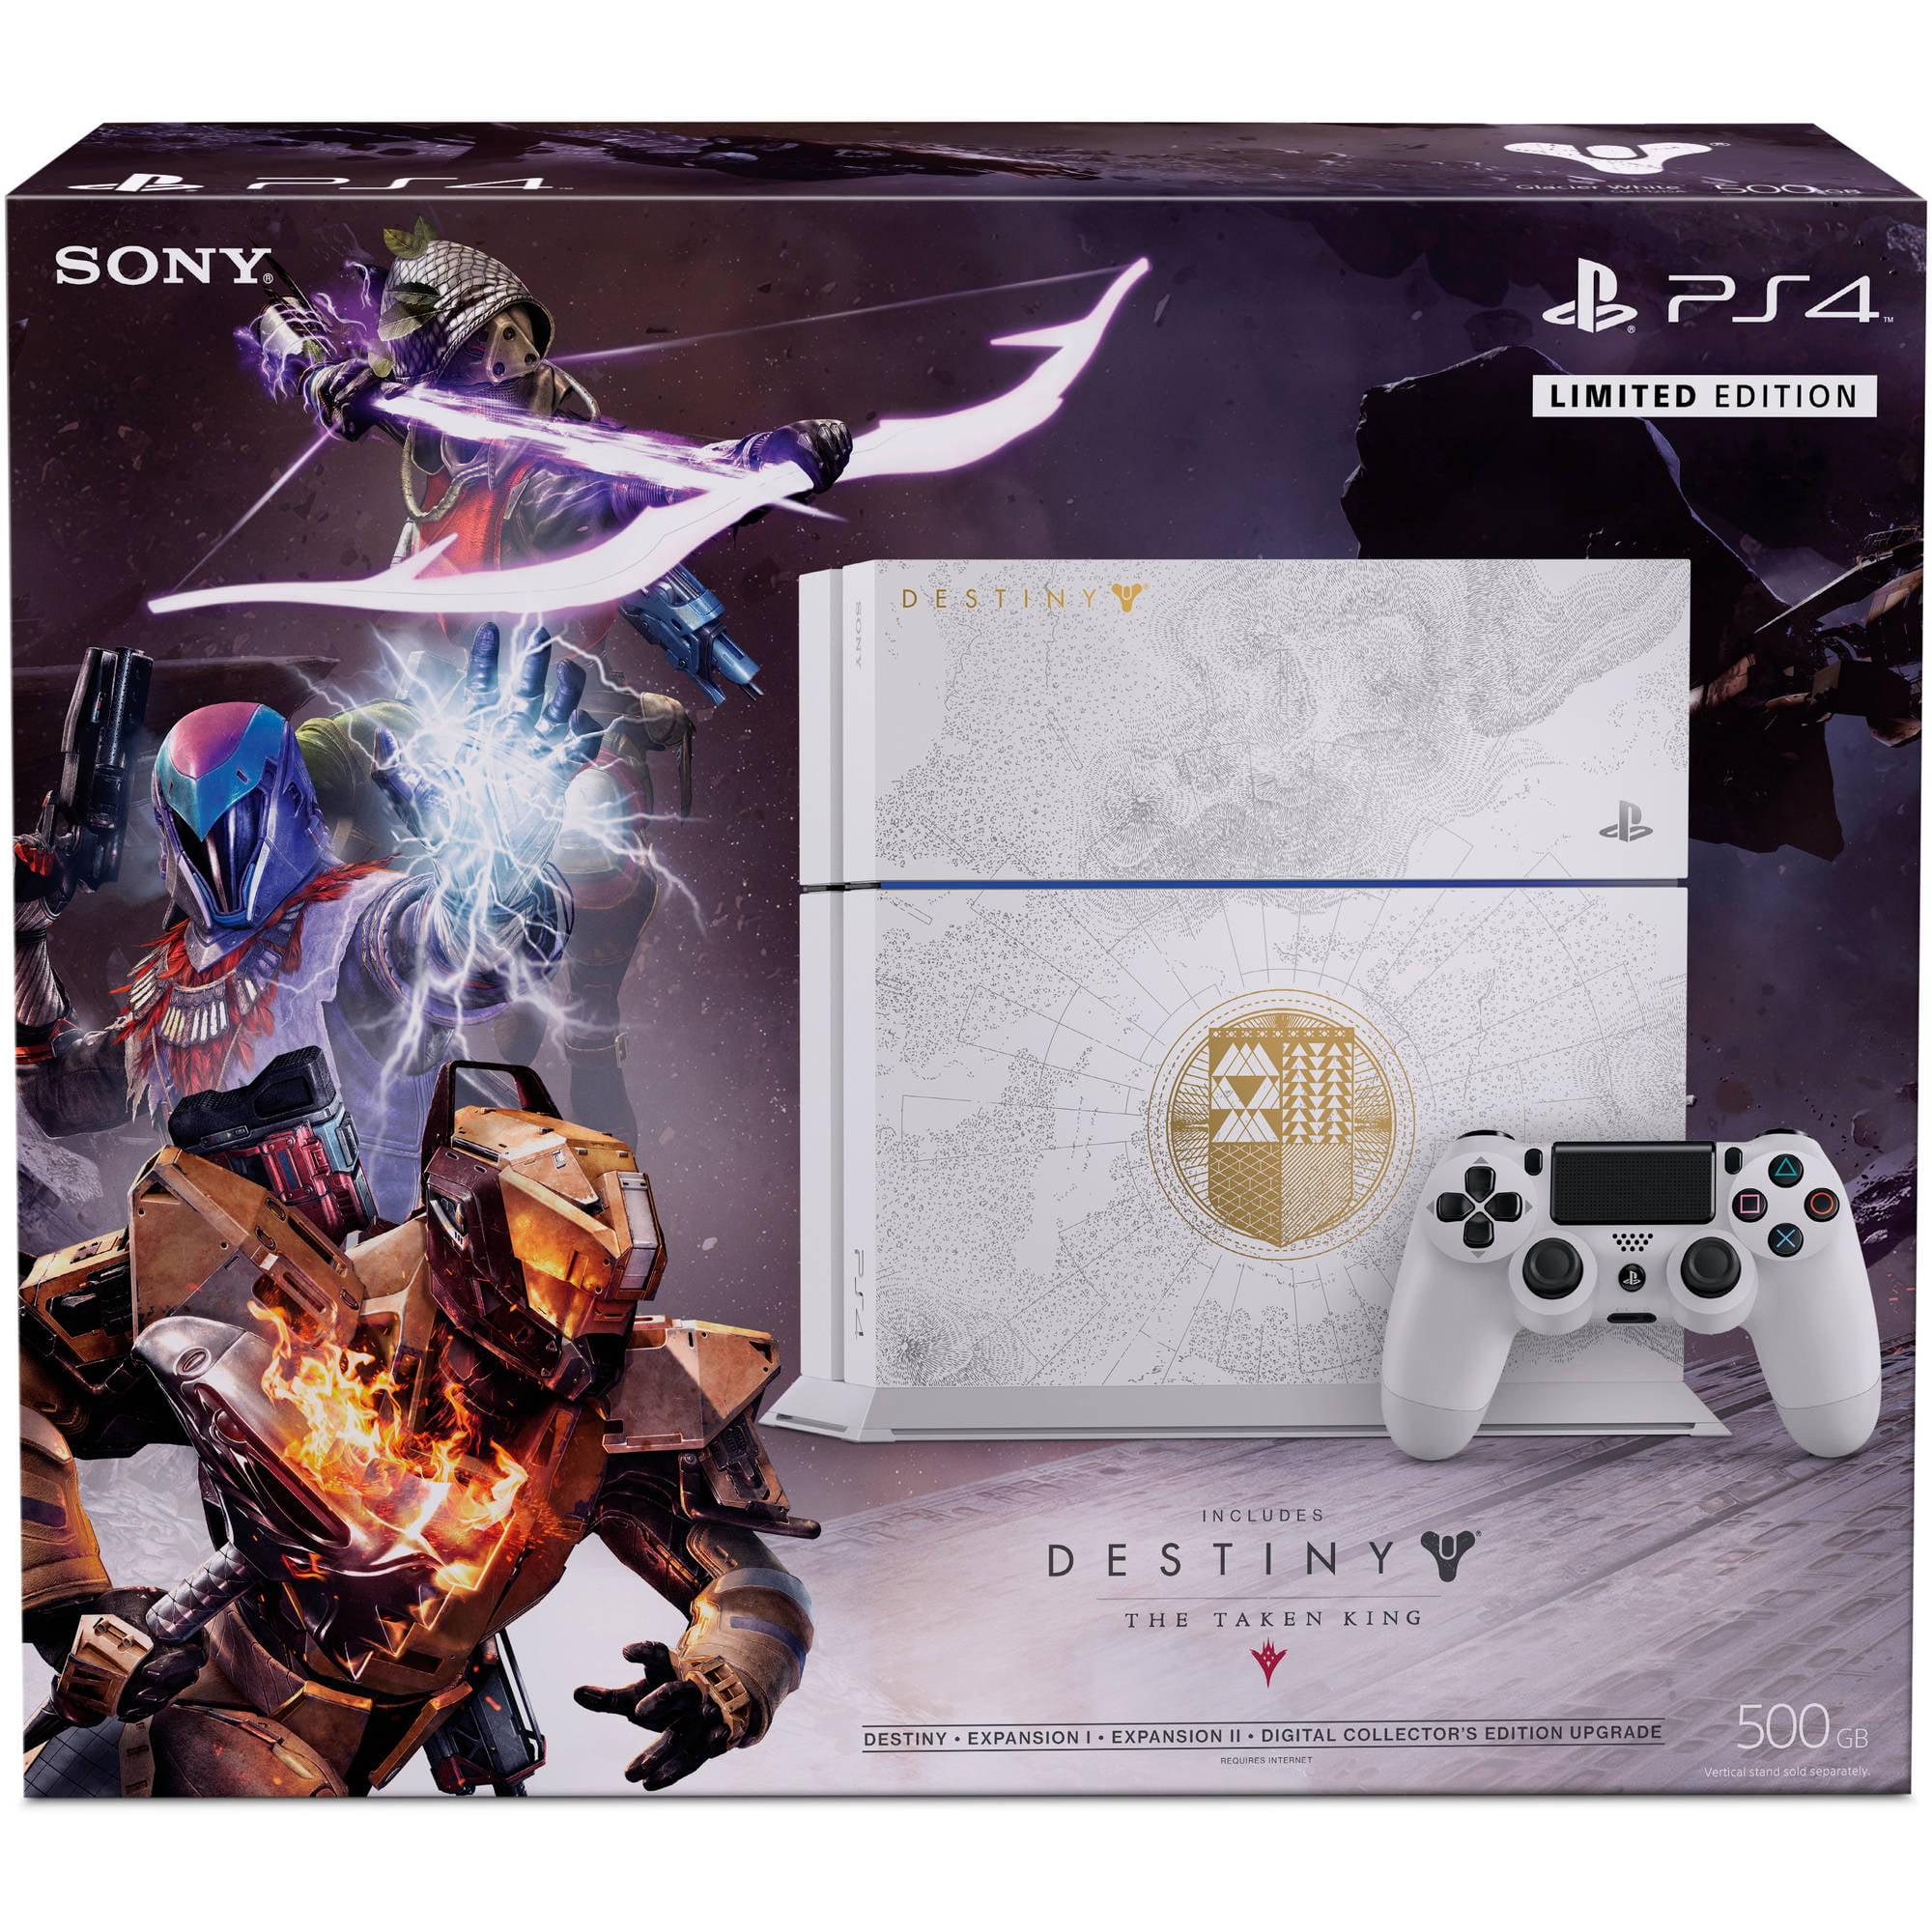 Playstation 4 500gb Limited Edition Destiny The Taken King Bundle Ps4 Walmart Com Walmart Com